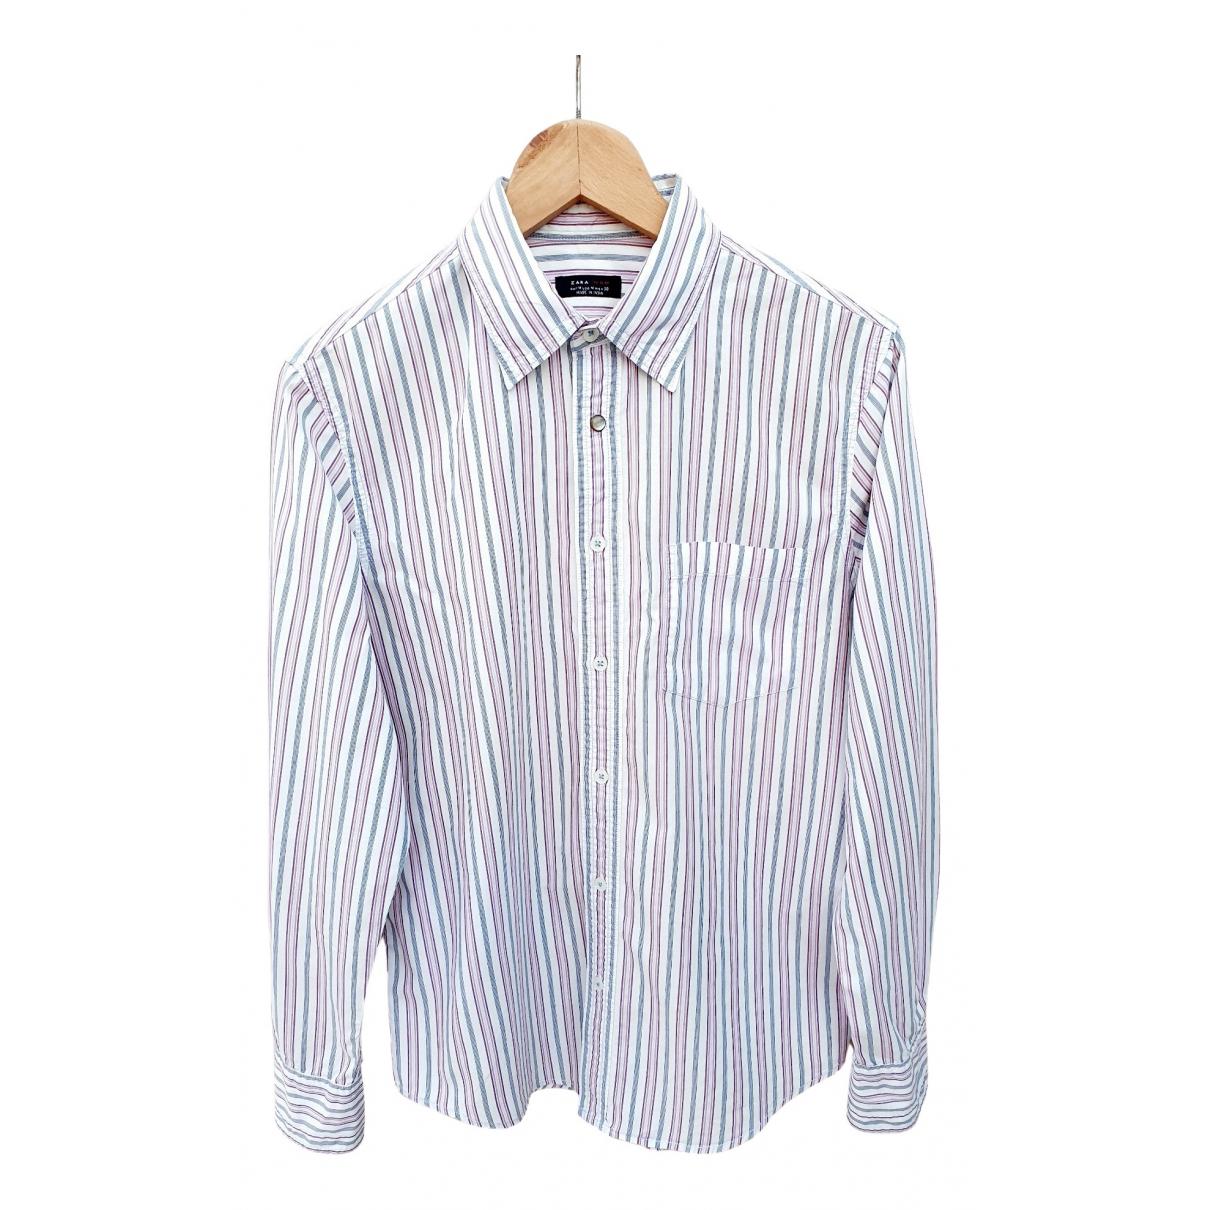 Zara \N White Cotton Shirts for Men M International